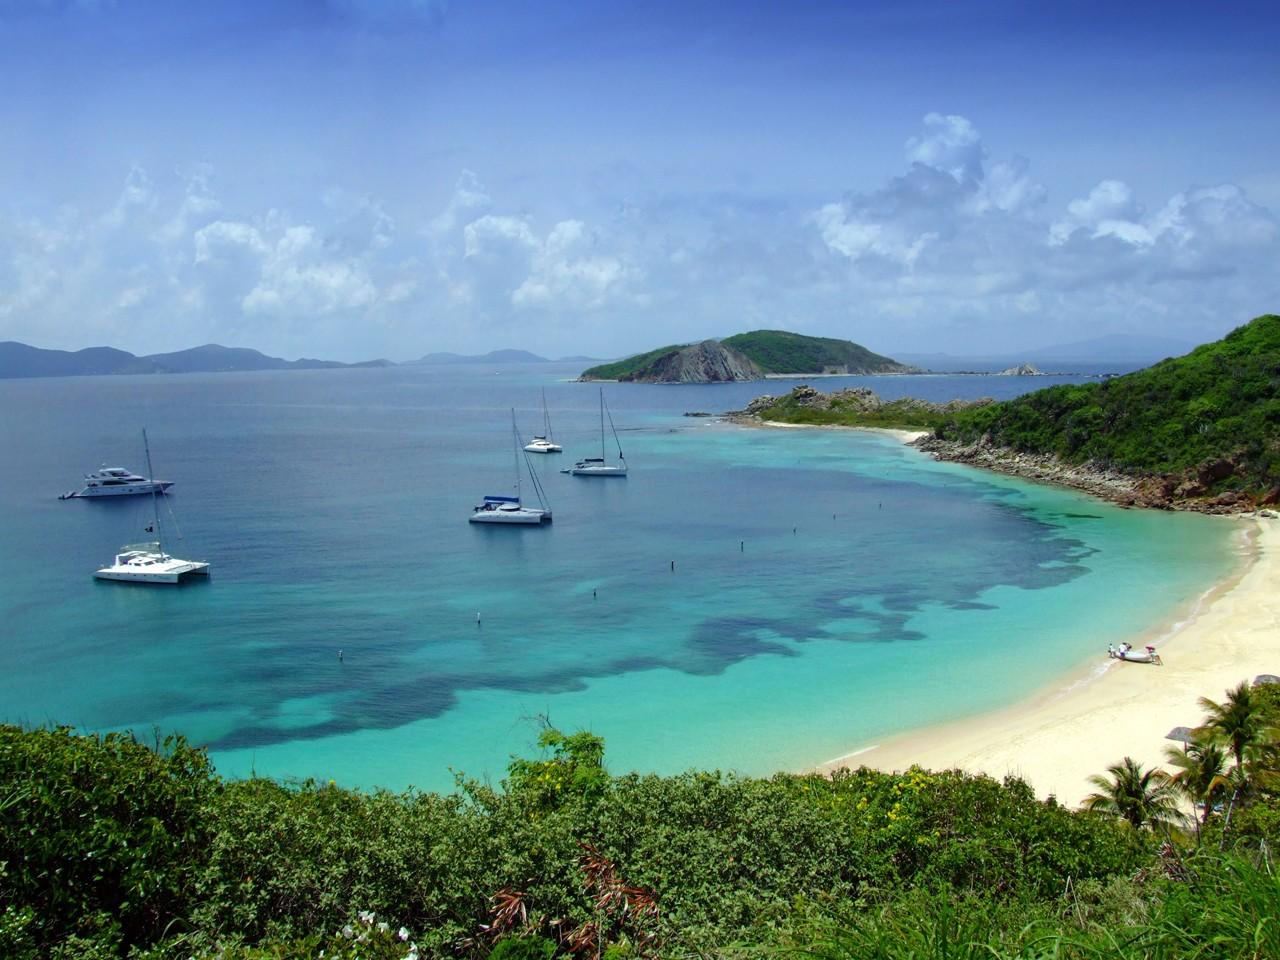 Temperatures In The British Virgin Islands